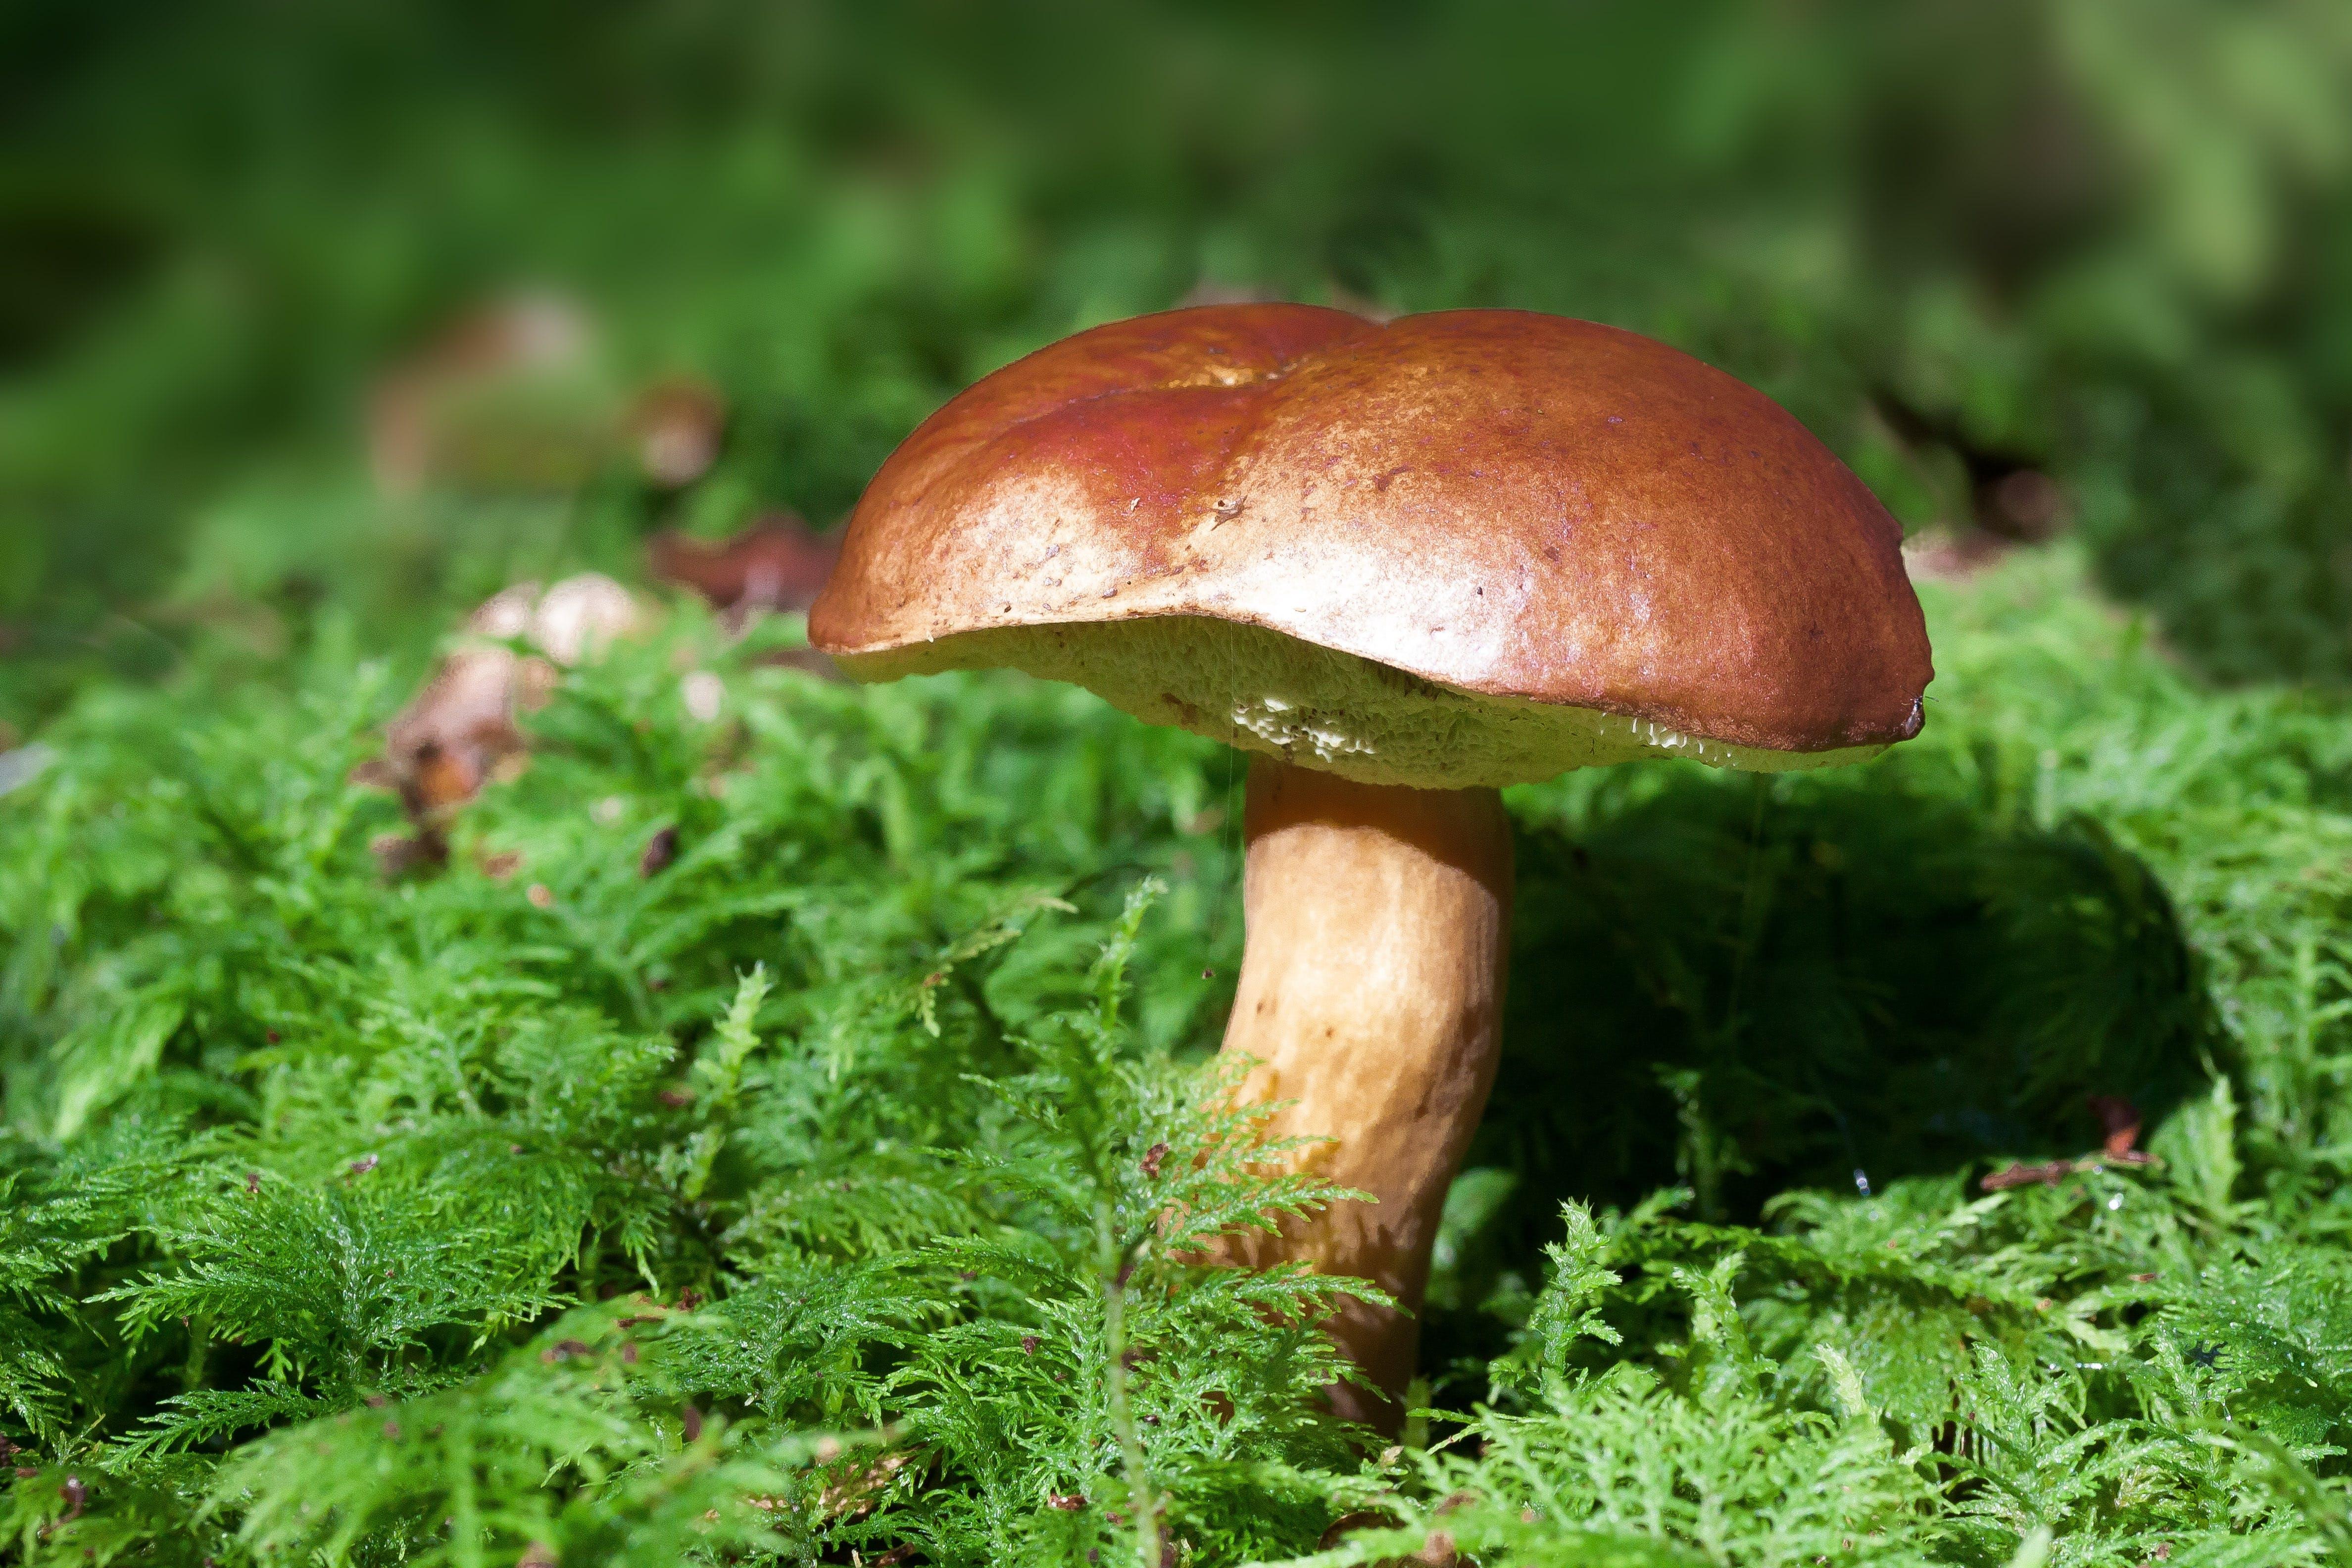 Brown Mushroom on Green Leaf Plant during Daytime